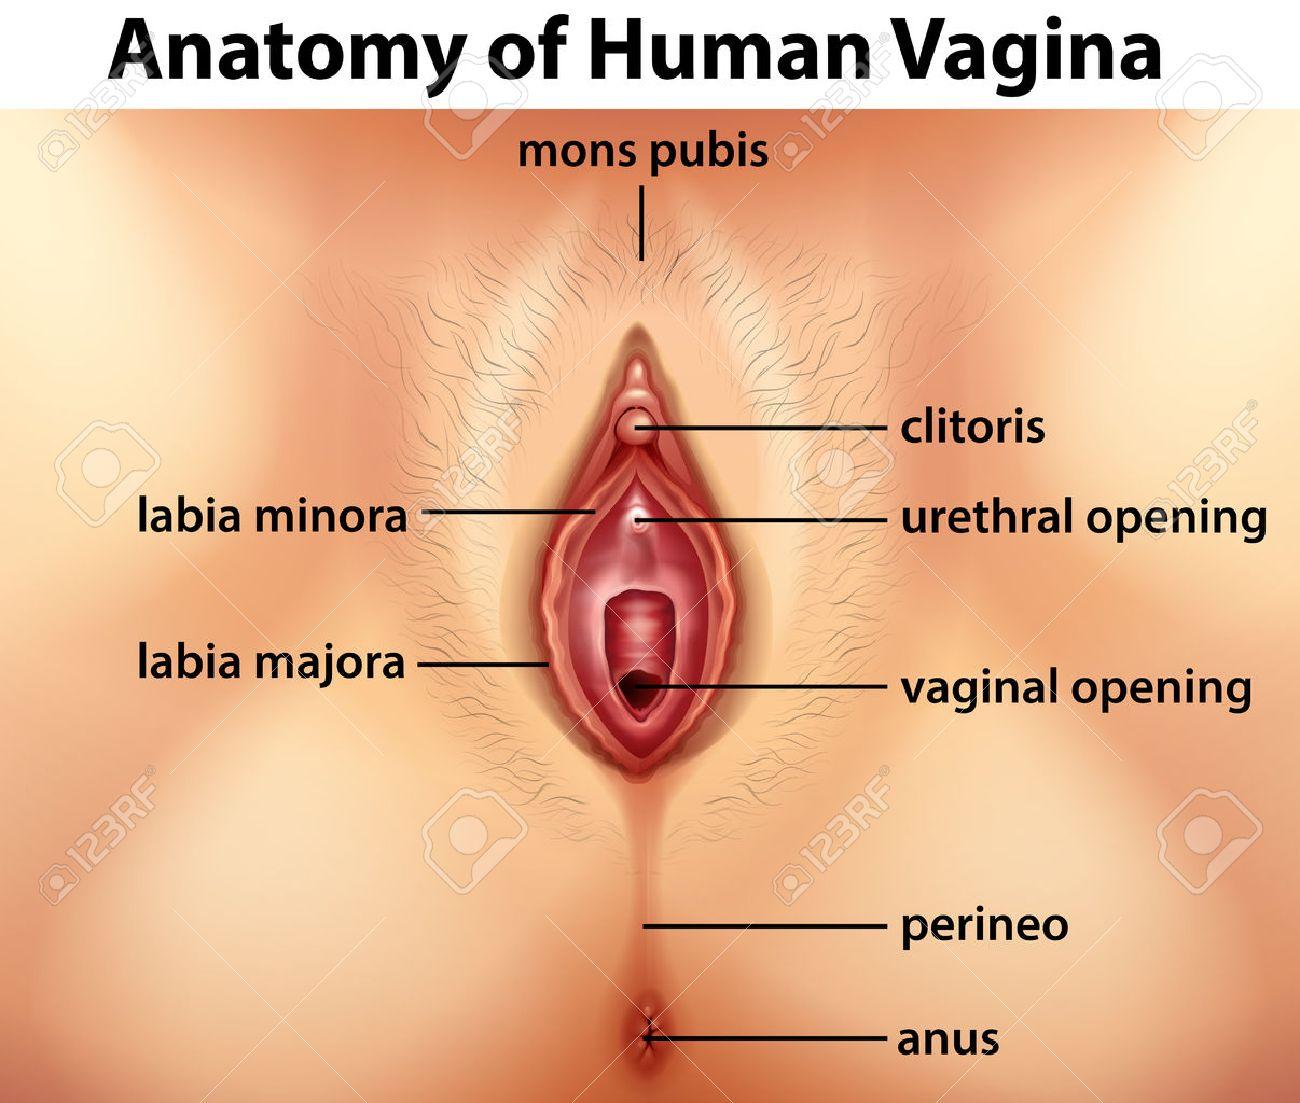 hight resolution of diagram showing anatomy of human vagina illustration stock vector 60452762